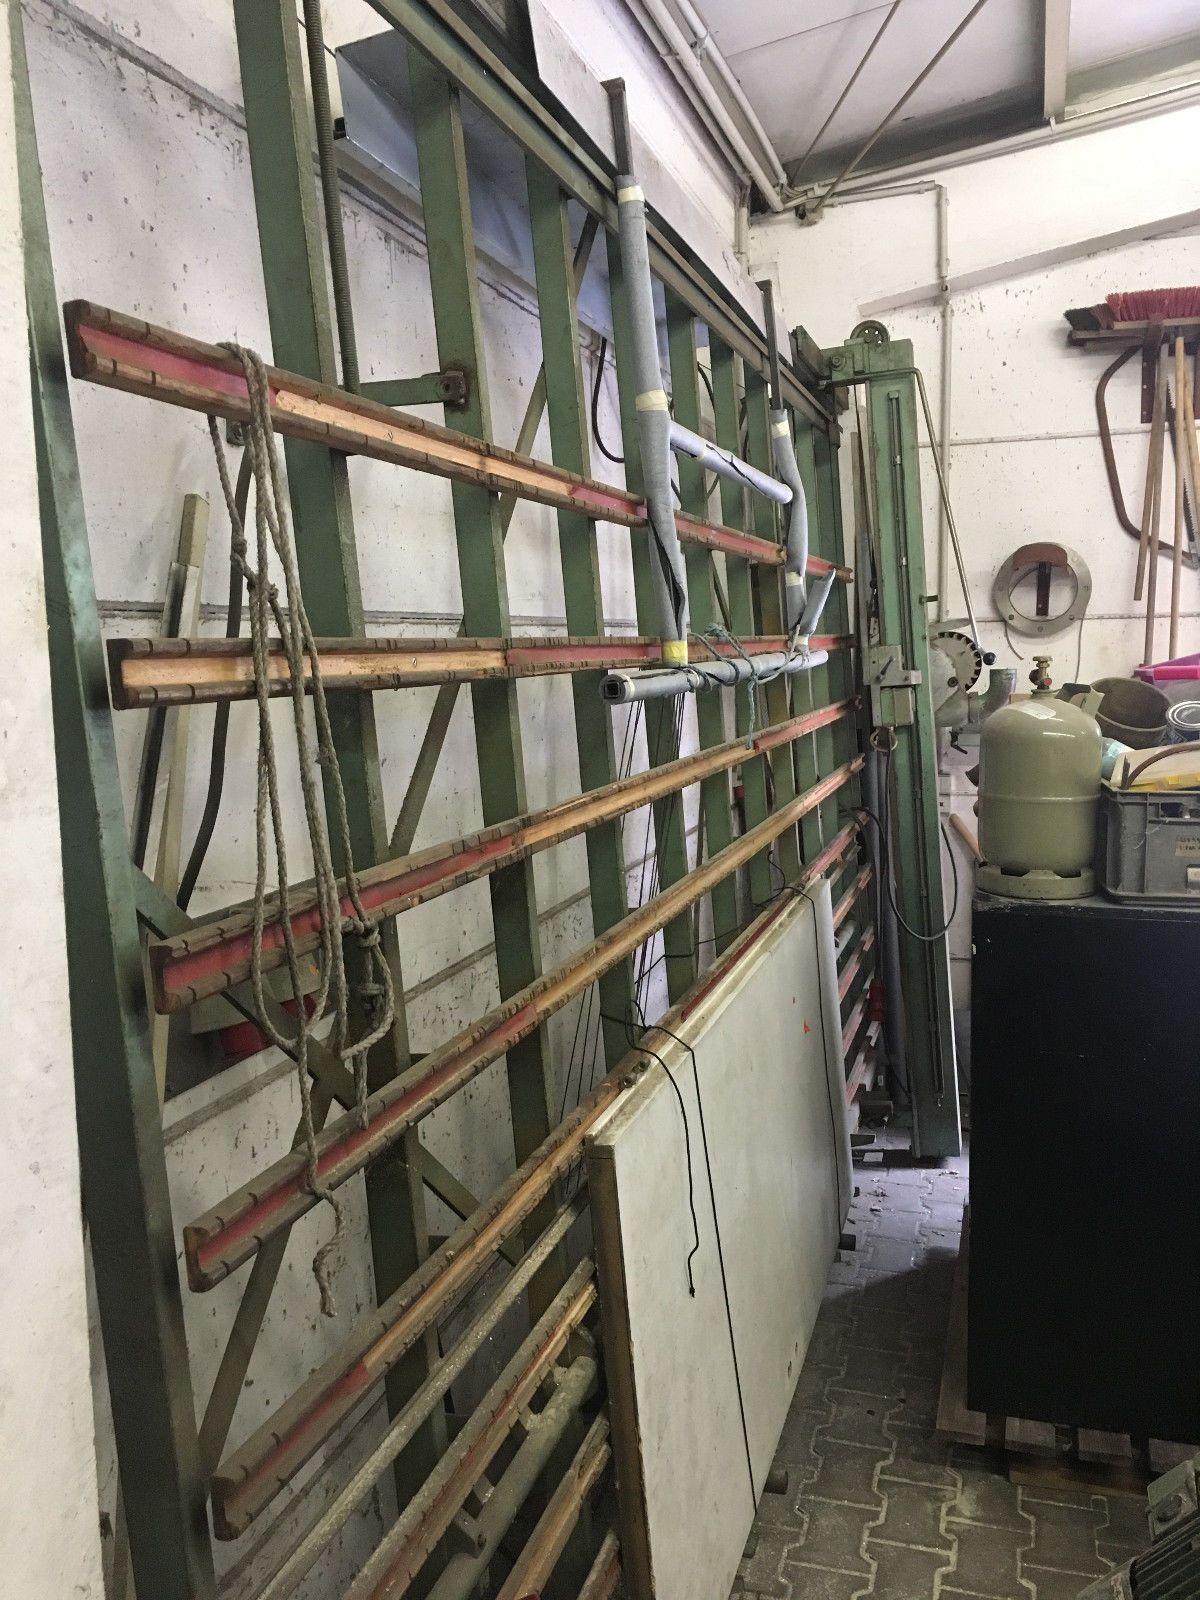 Gebrauchte Vertikale Plattensäge, Plattenaufteilsäge, Säge, Holzsäge, ca.4mx3m